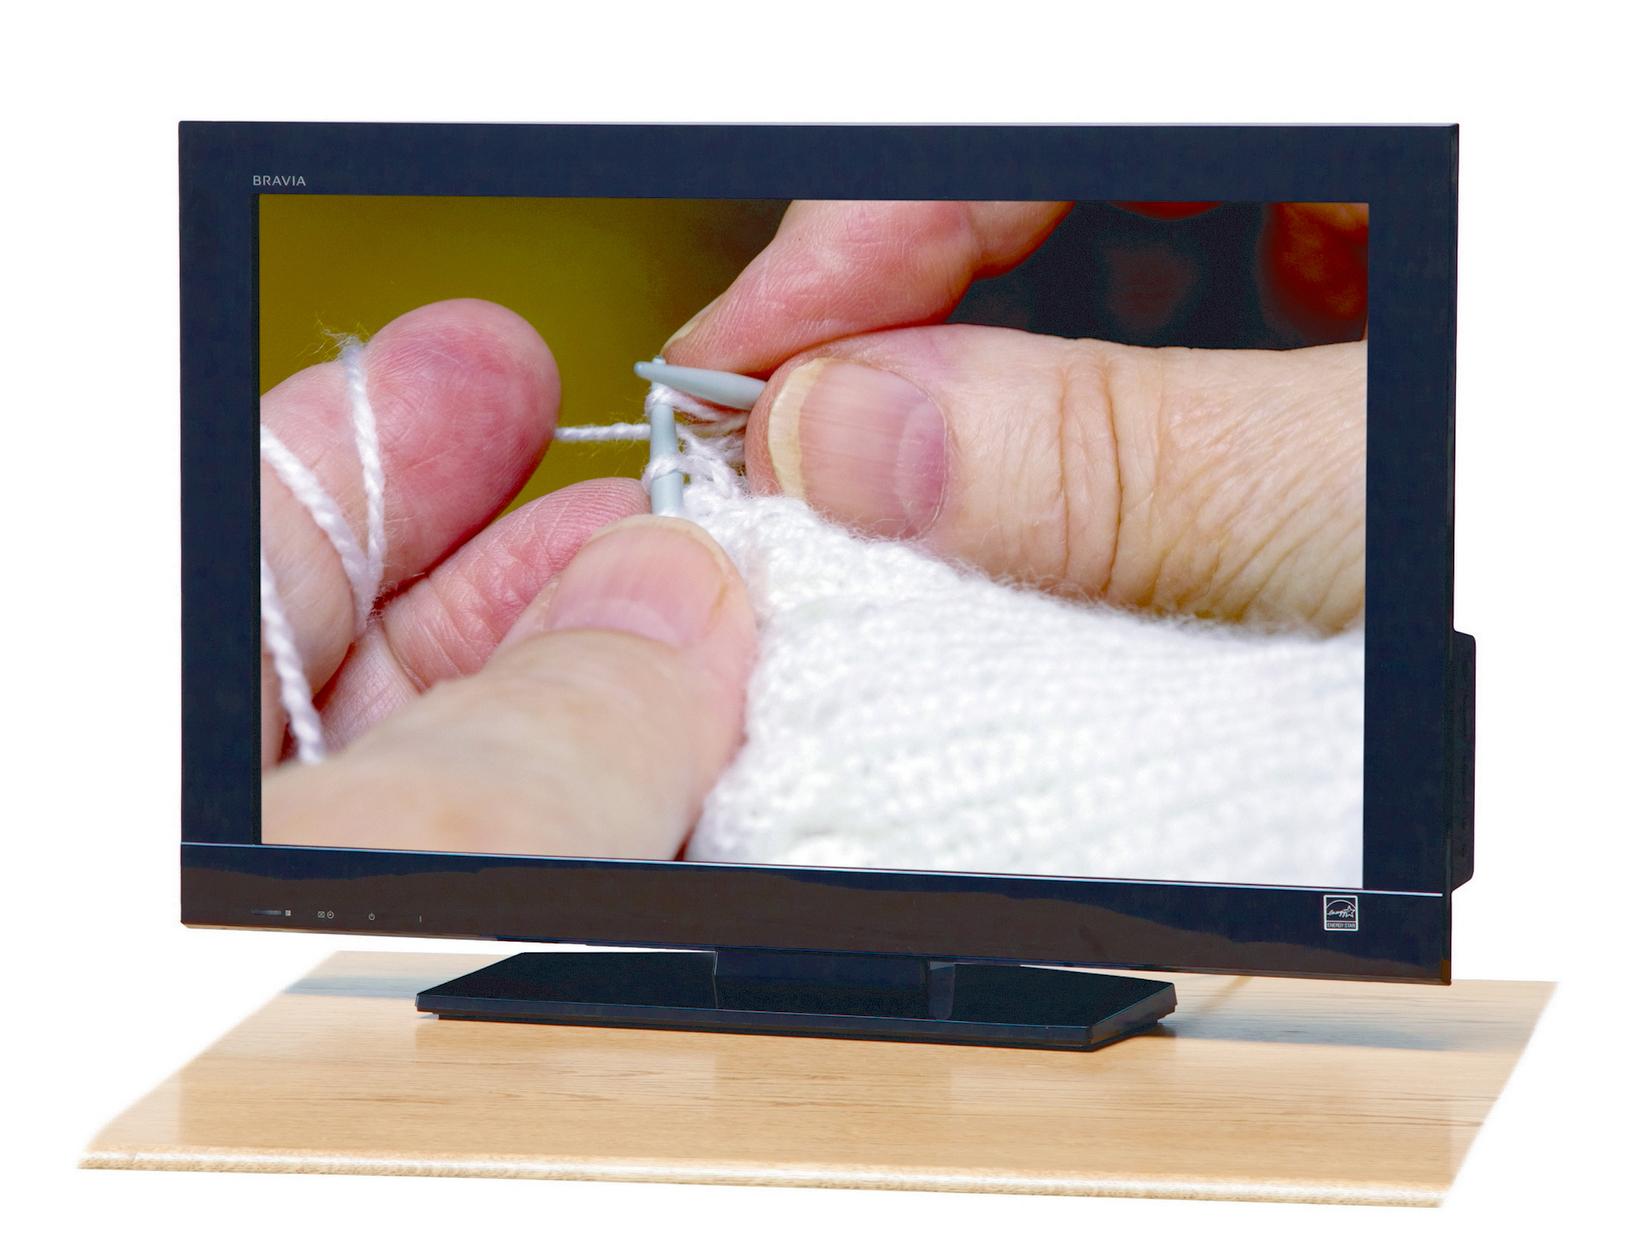 Monitor with knitting; RGB.jpg